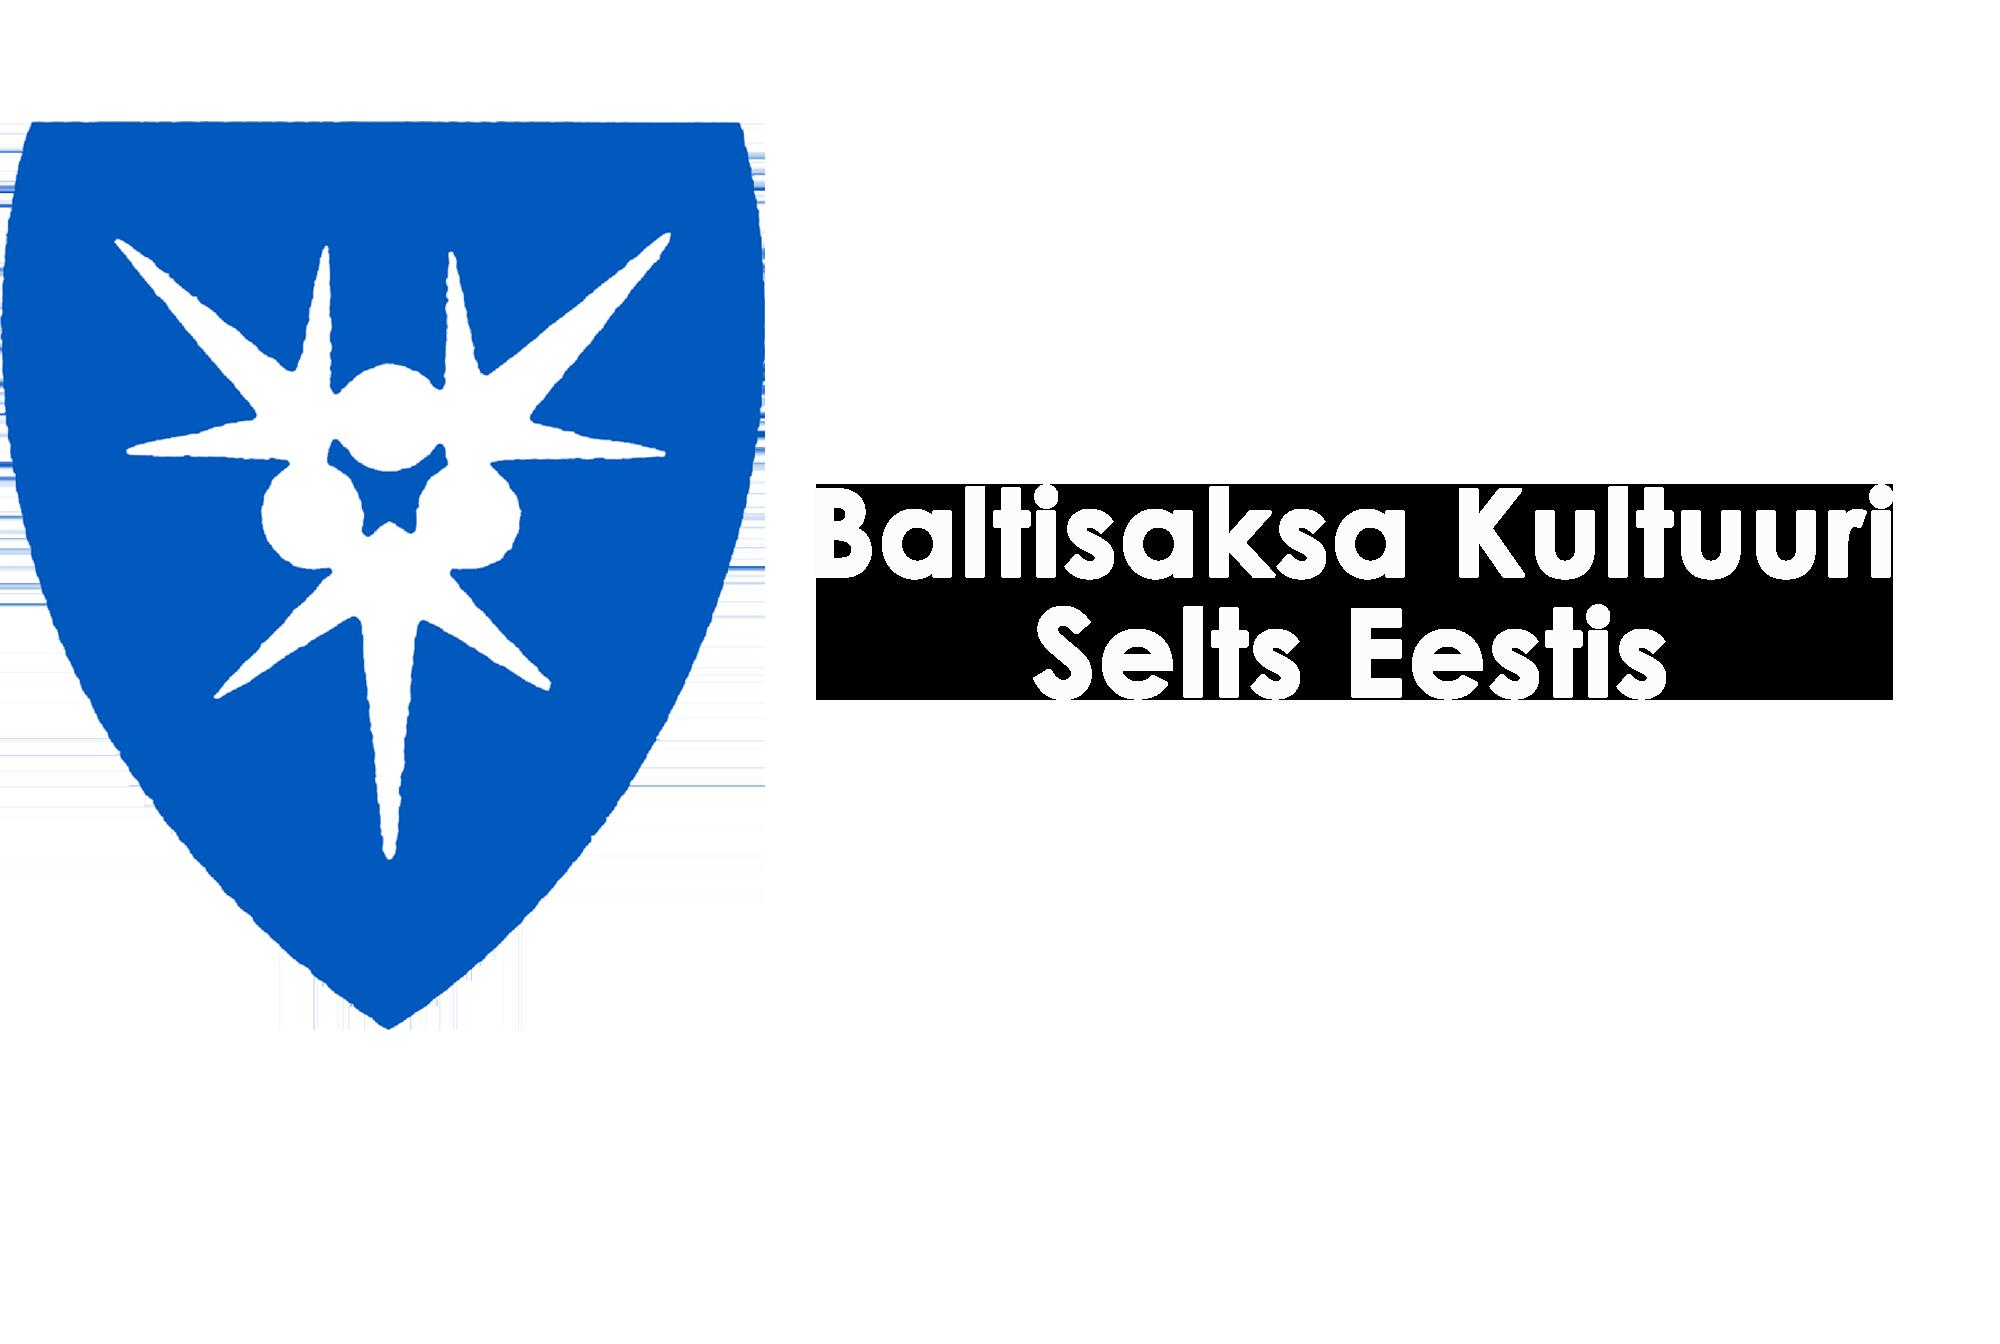 Baltisaksa Kultuuri Selts Eestis